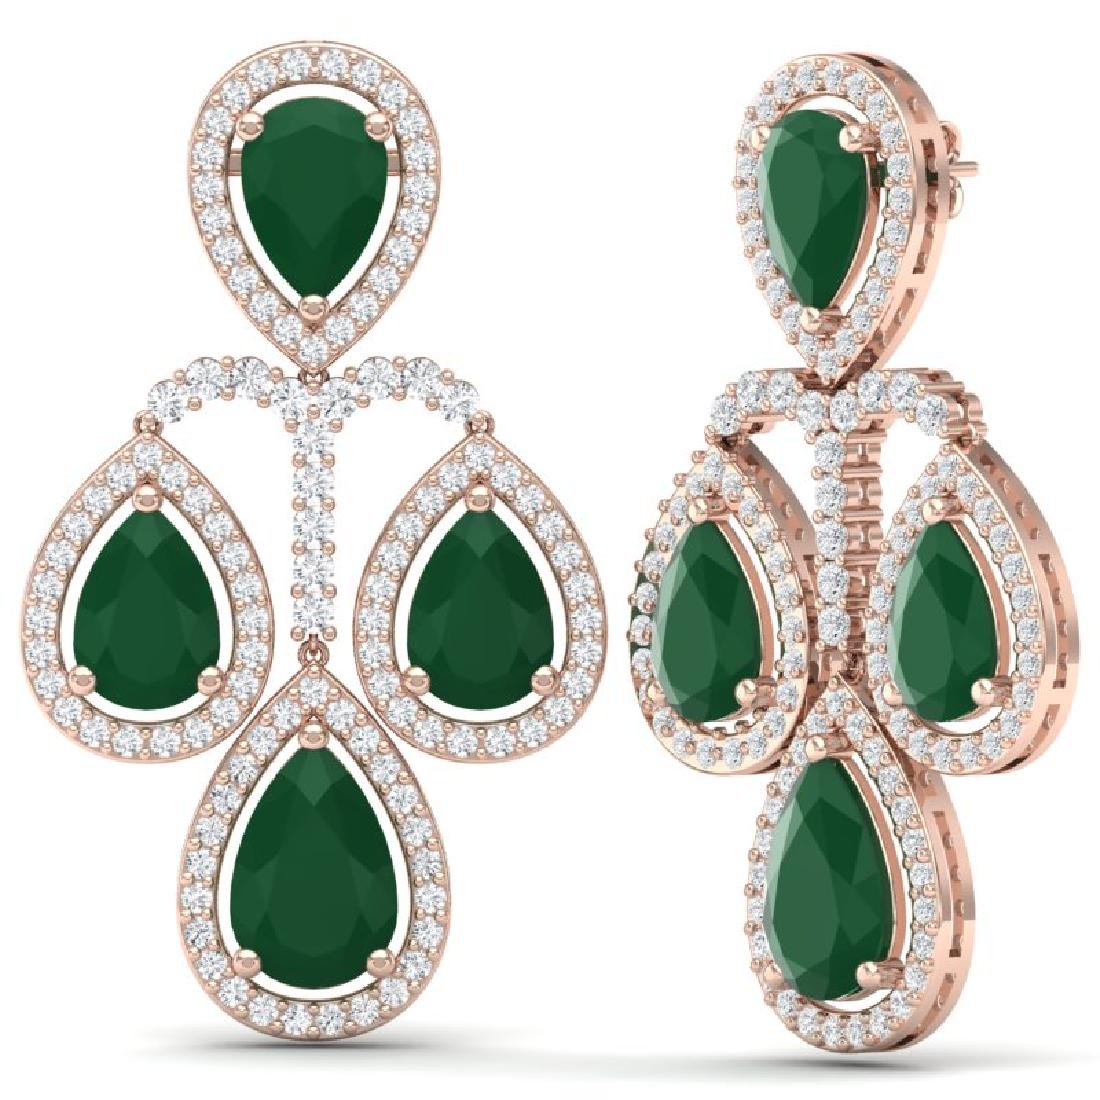 29.23 CTW Royalty Emerald & VS Diamond Earrings 18K - 3